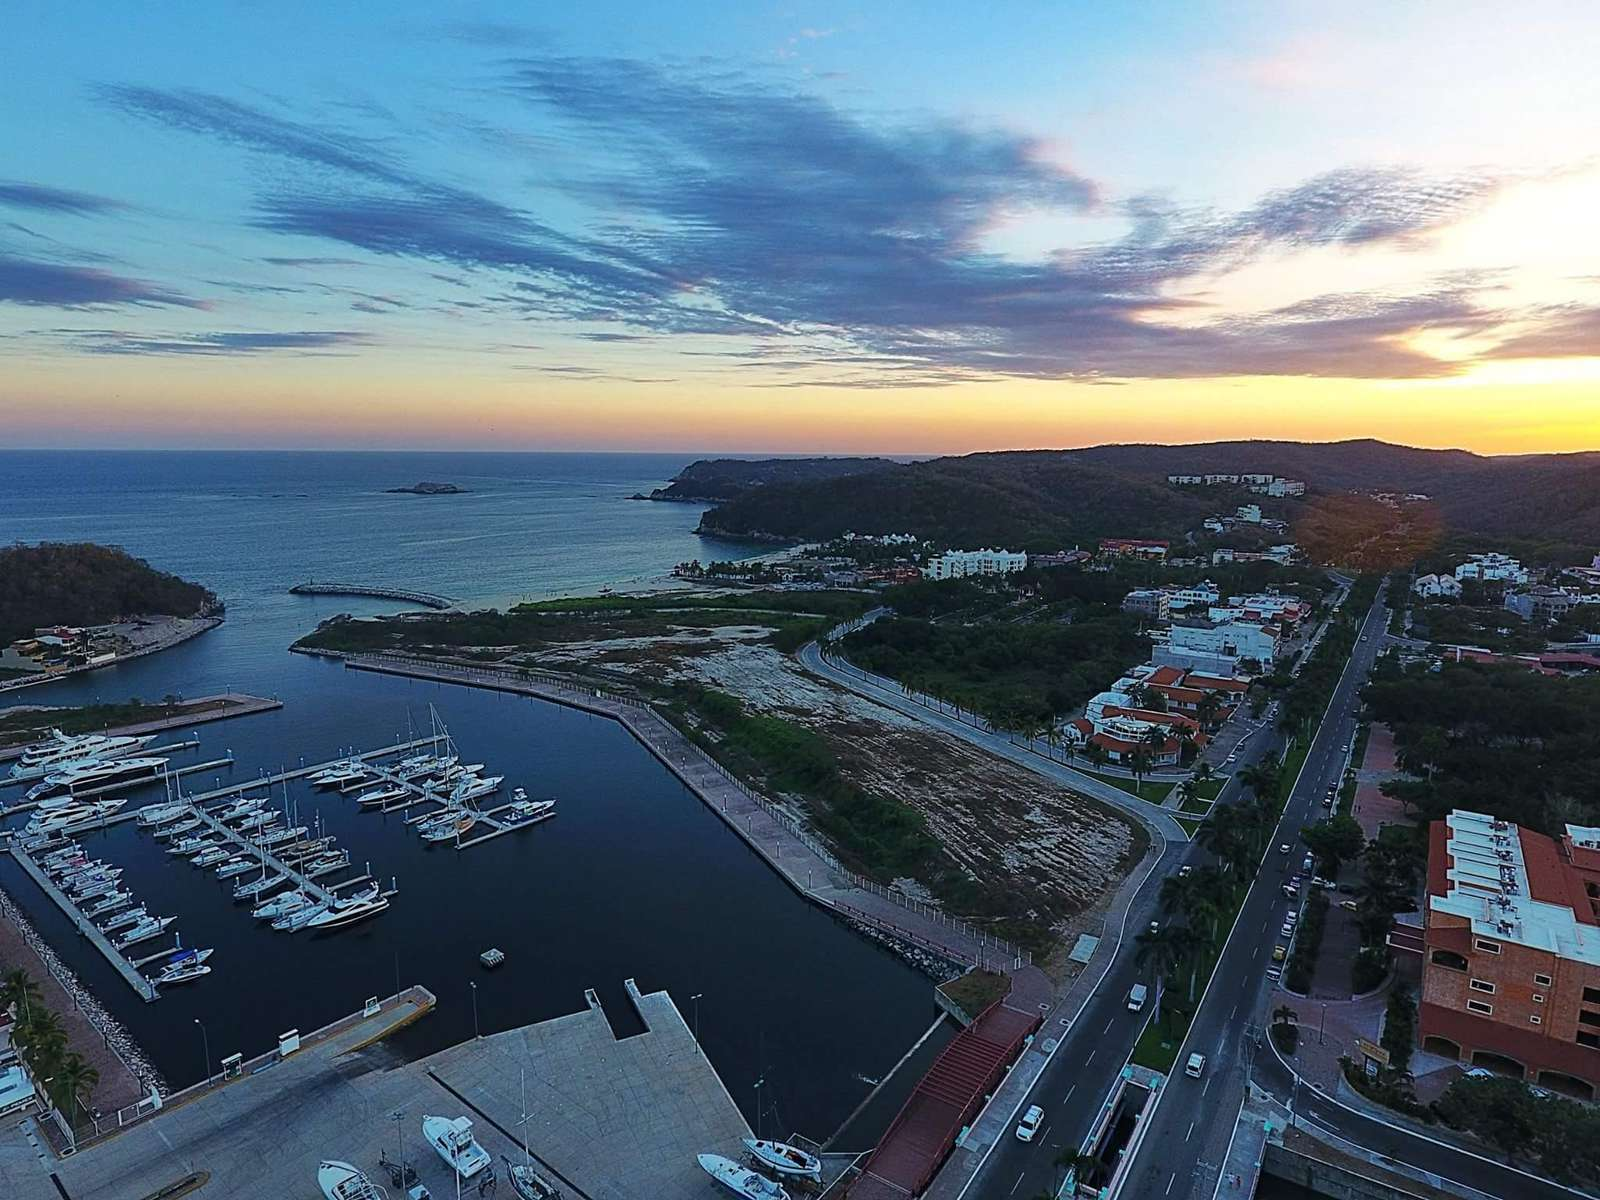 Aerial view of marina Chahue and beach